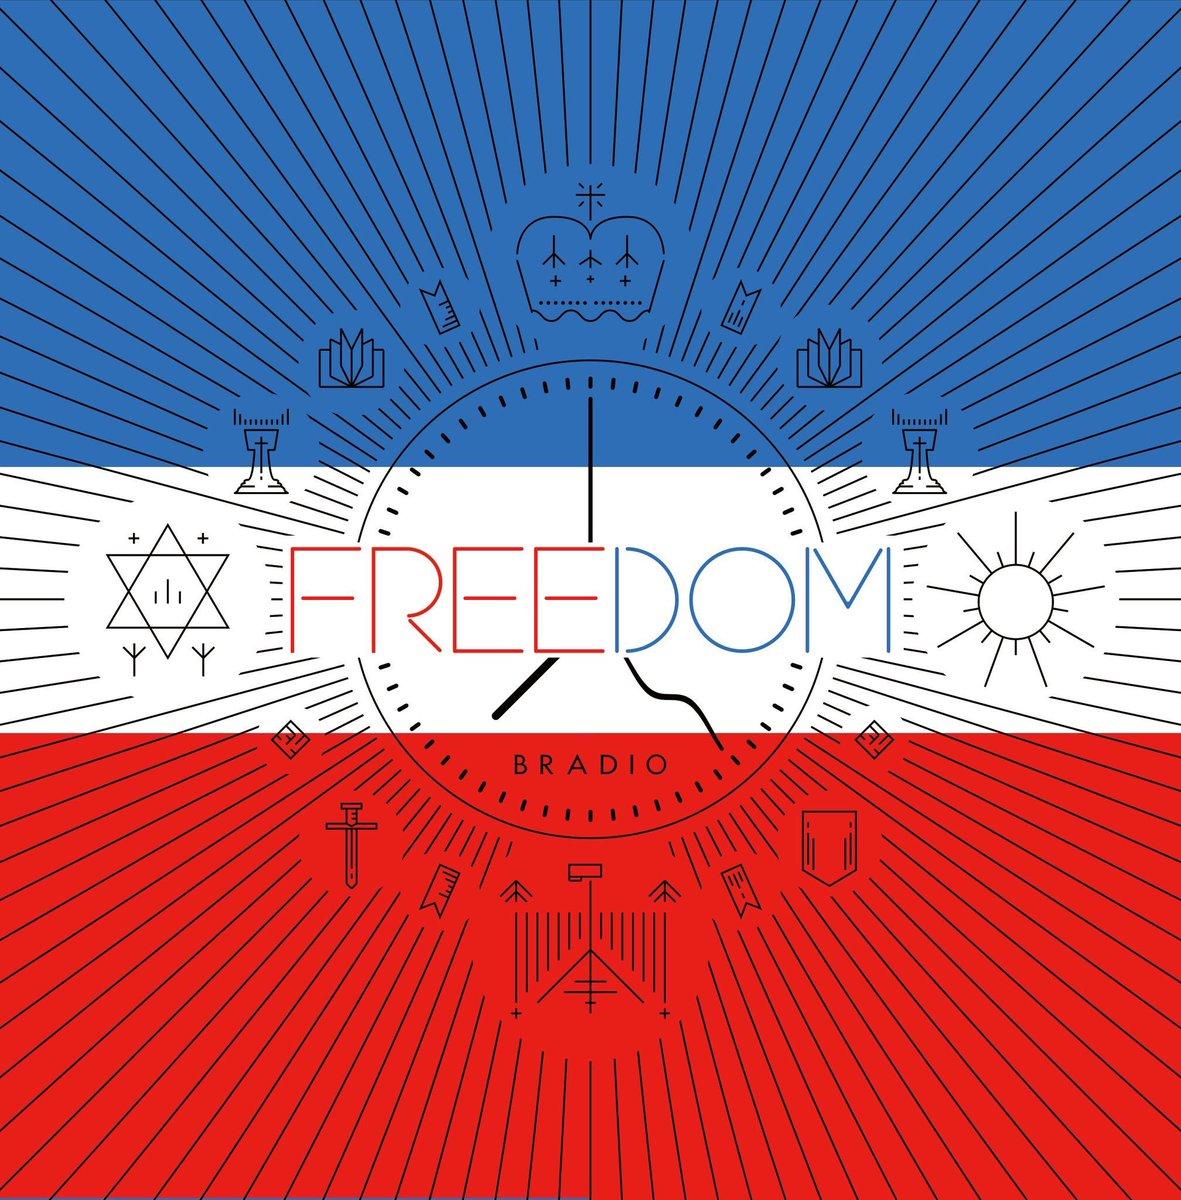 BRADIO 2nd Full Album  【FREEDOM】  発売中💿💿💿!  初回盤は昨年7…